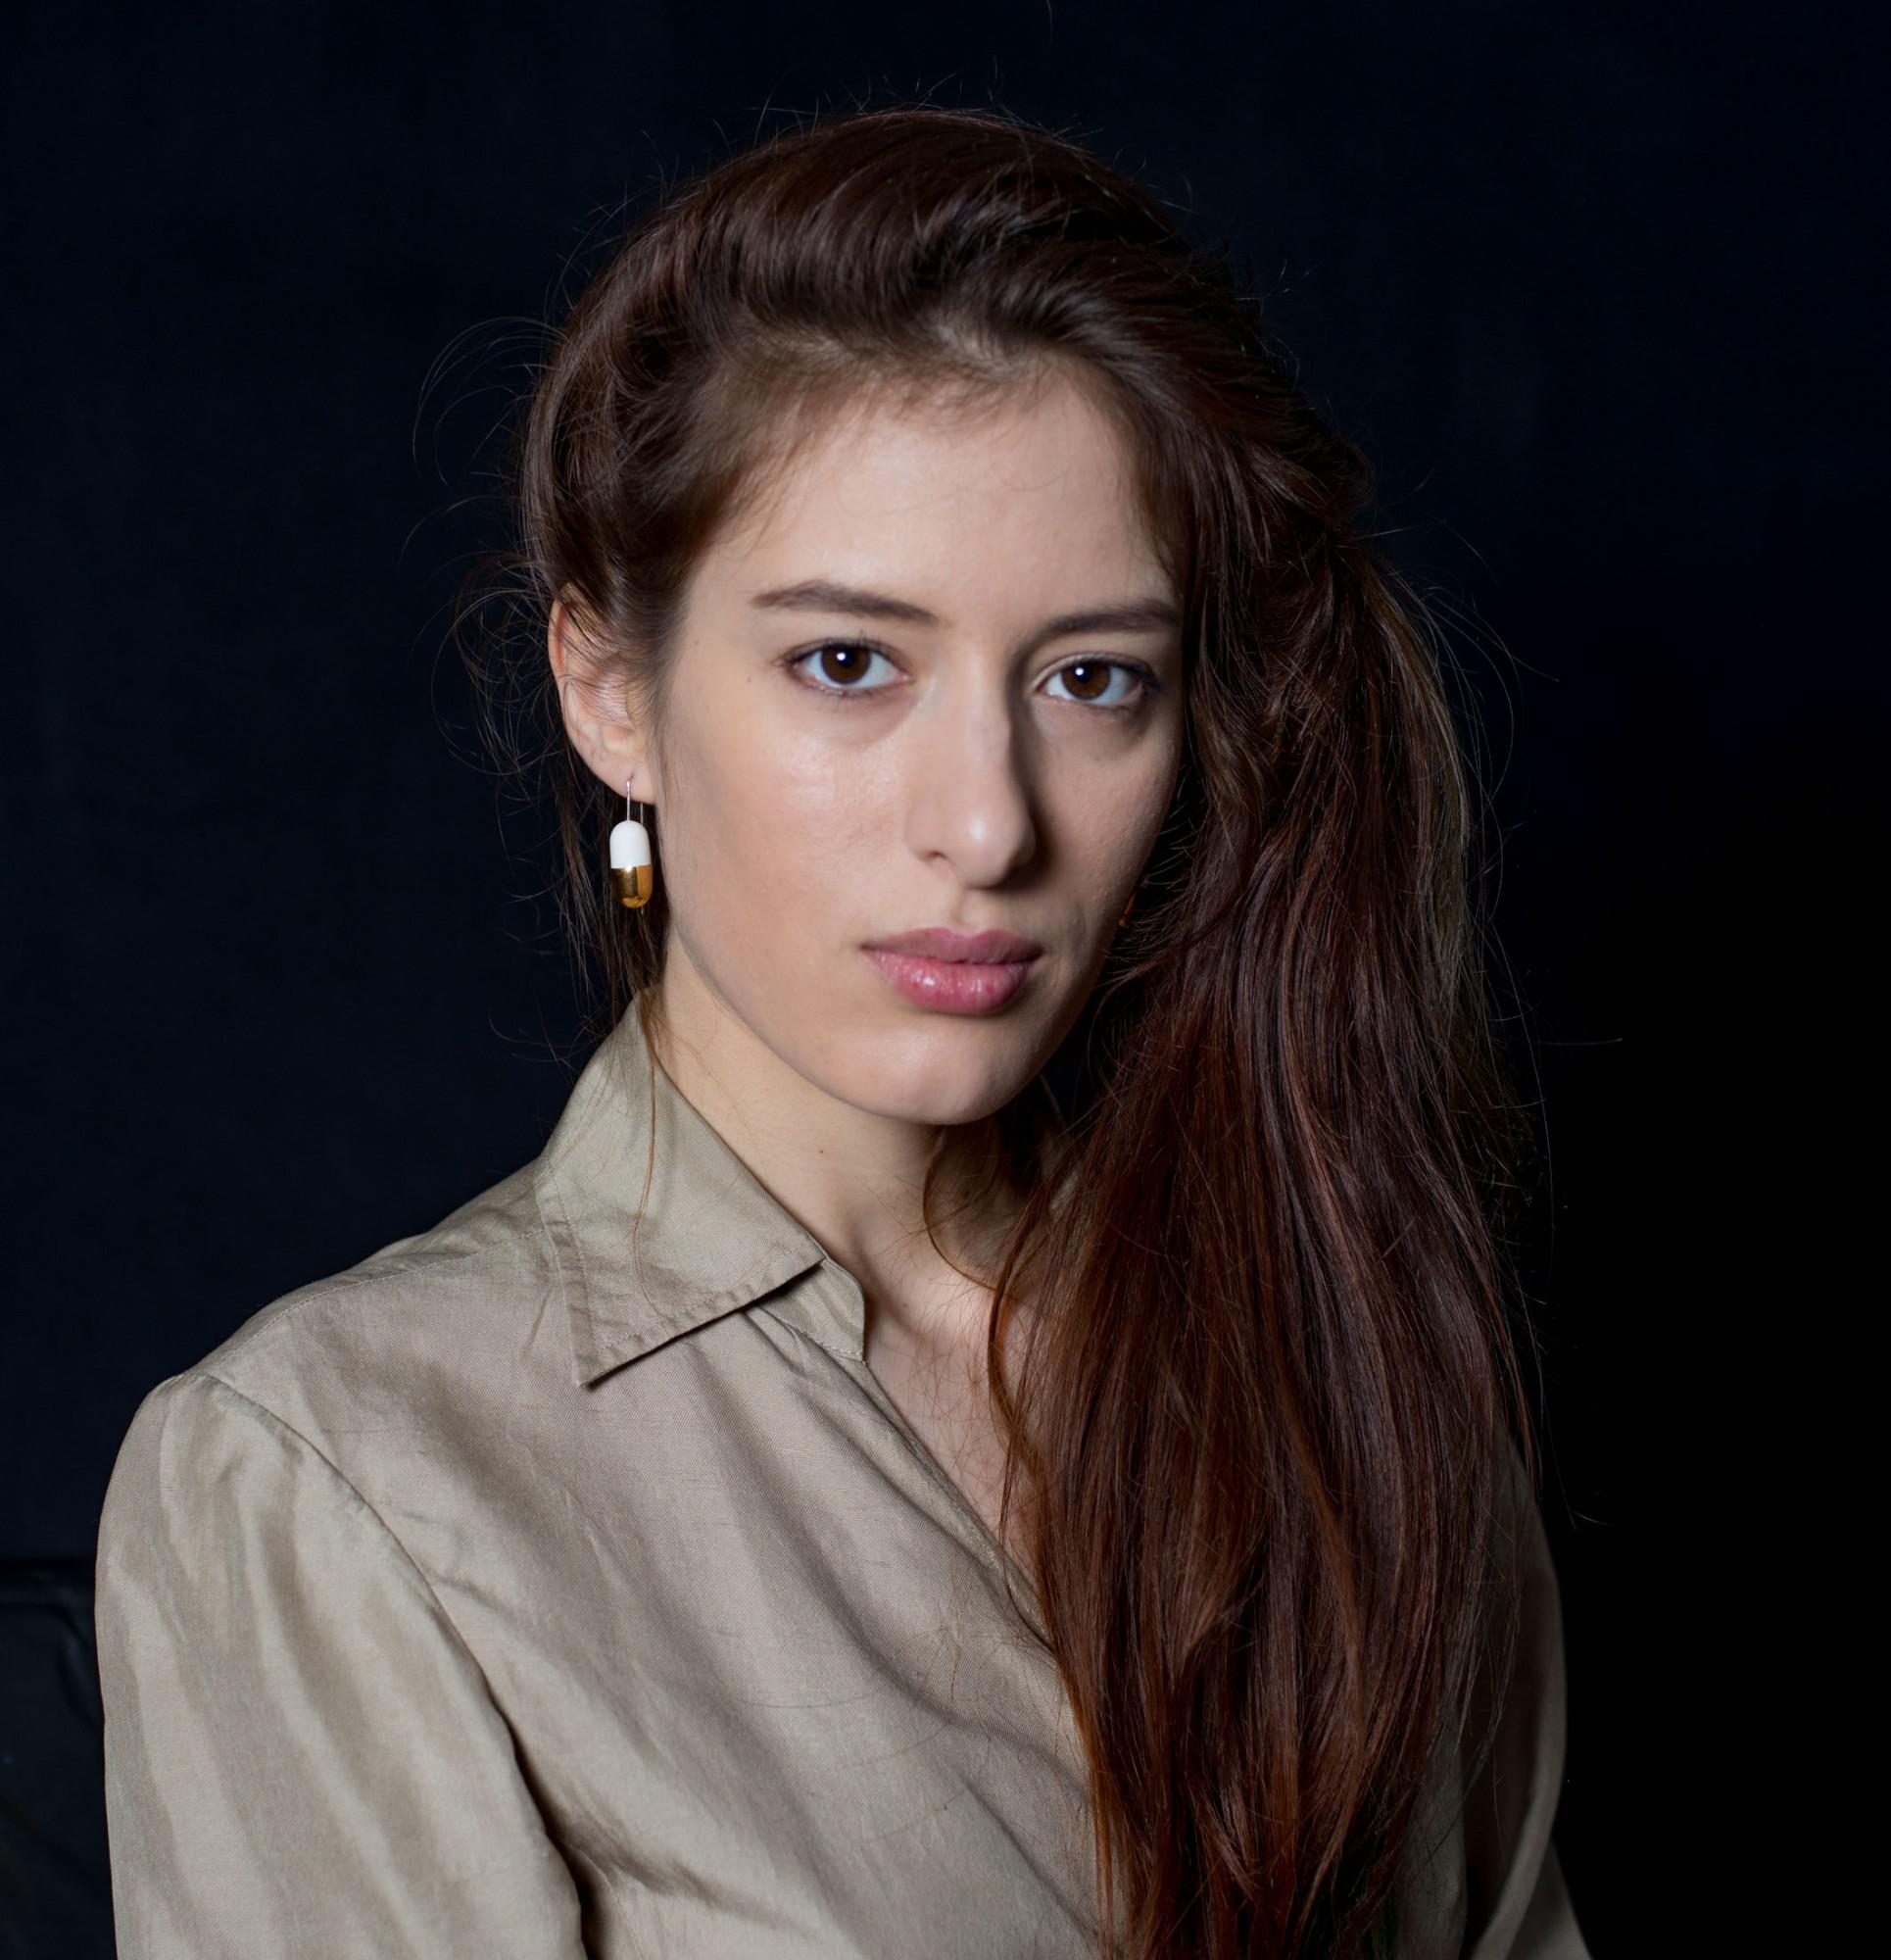 Anna-Kiryakova-Golden-Pills-Ohrringe-Porzellan-Schmuck-2